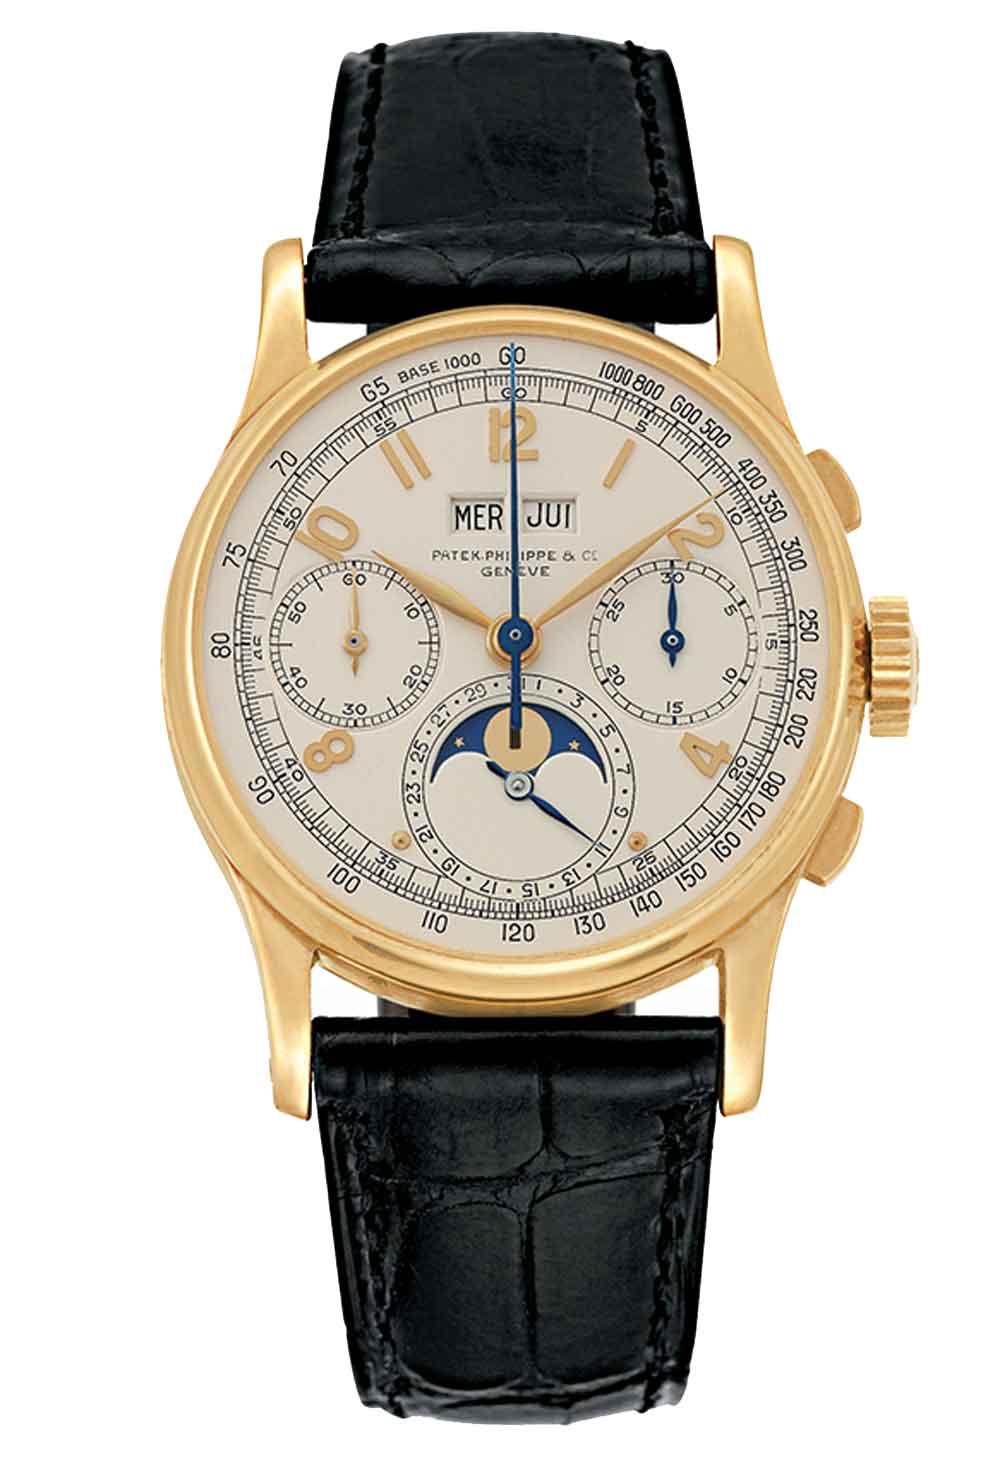 Reloj patek-philippe_1941-Ref-1518 calendario perpetuo